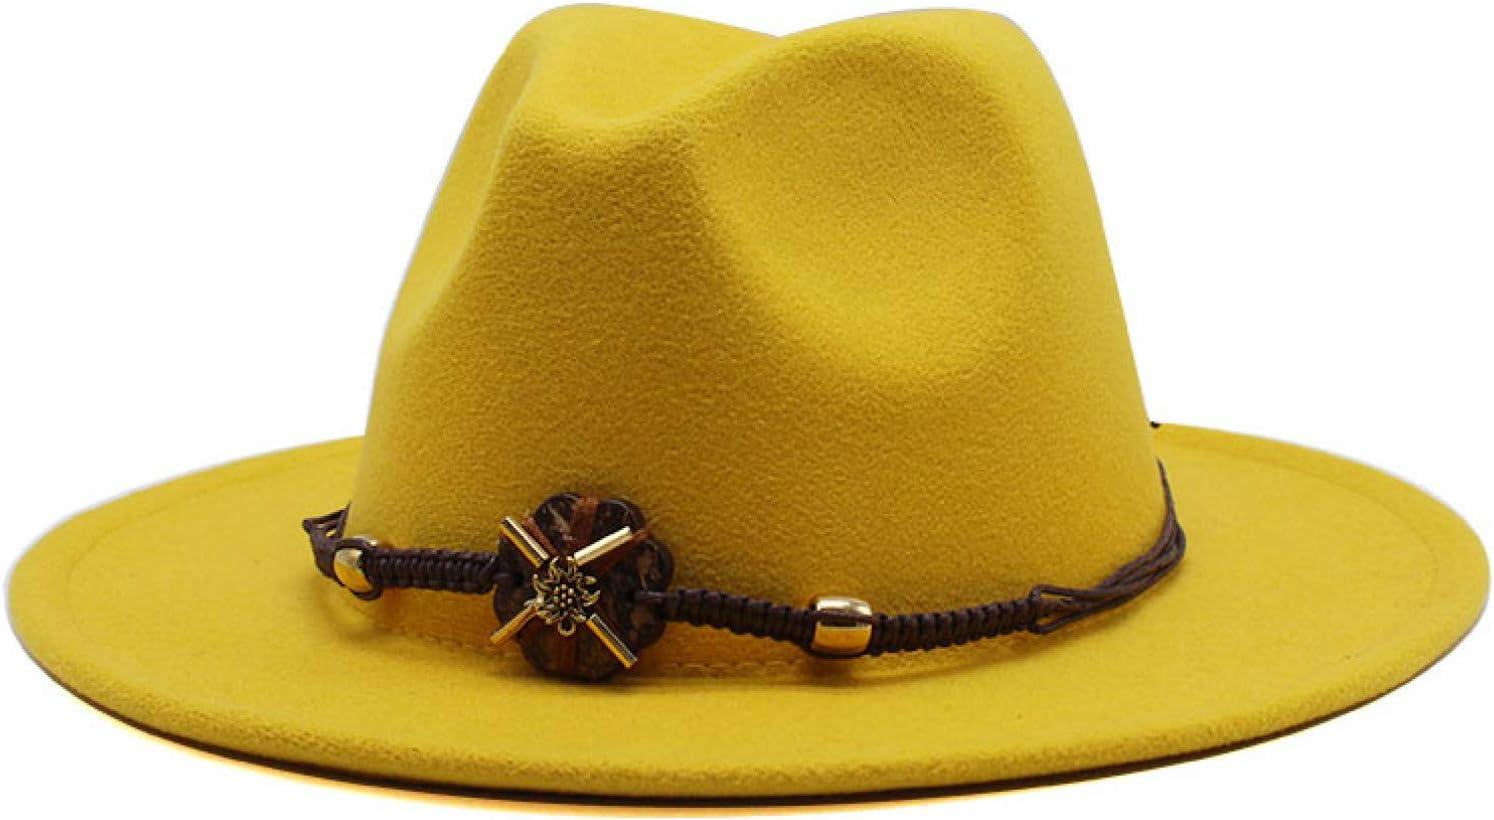 BAJIE Fedora Women'S Men'S Wide Brim Wool Felt Jazz Fedora Hat Style Denim Party Formal Dress Hat Large Yellow White 19Color